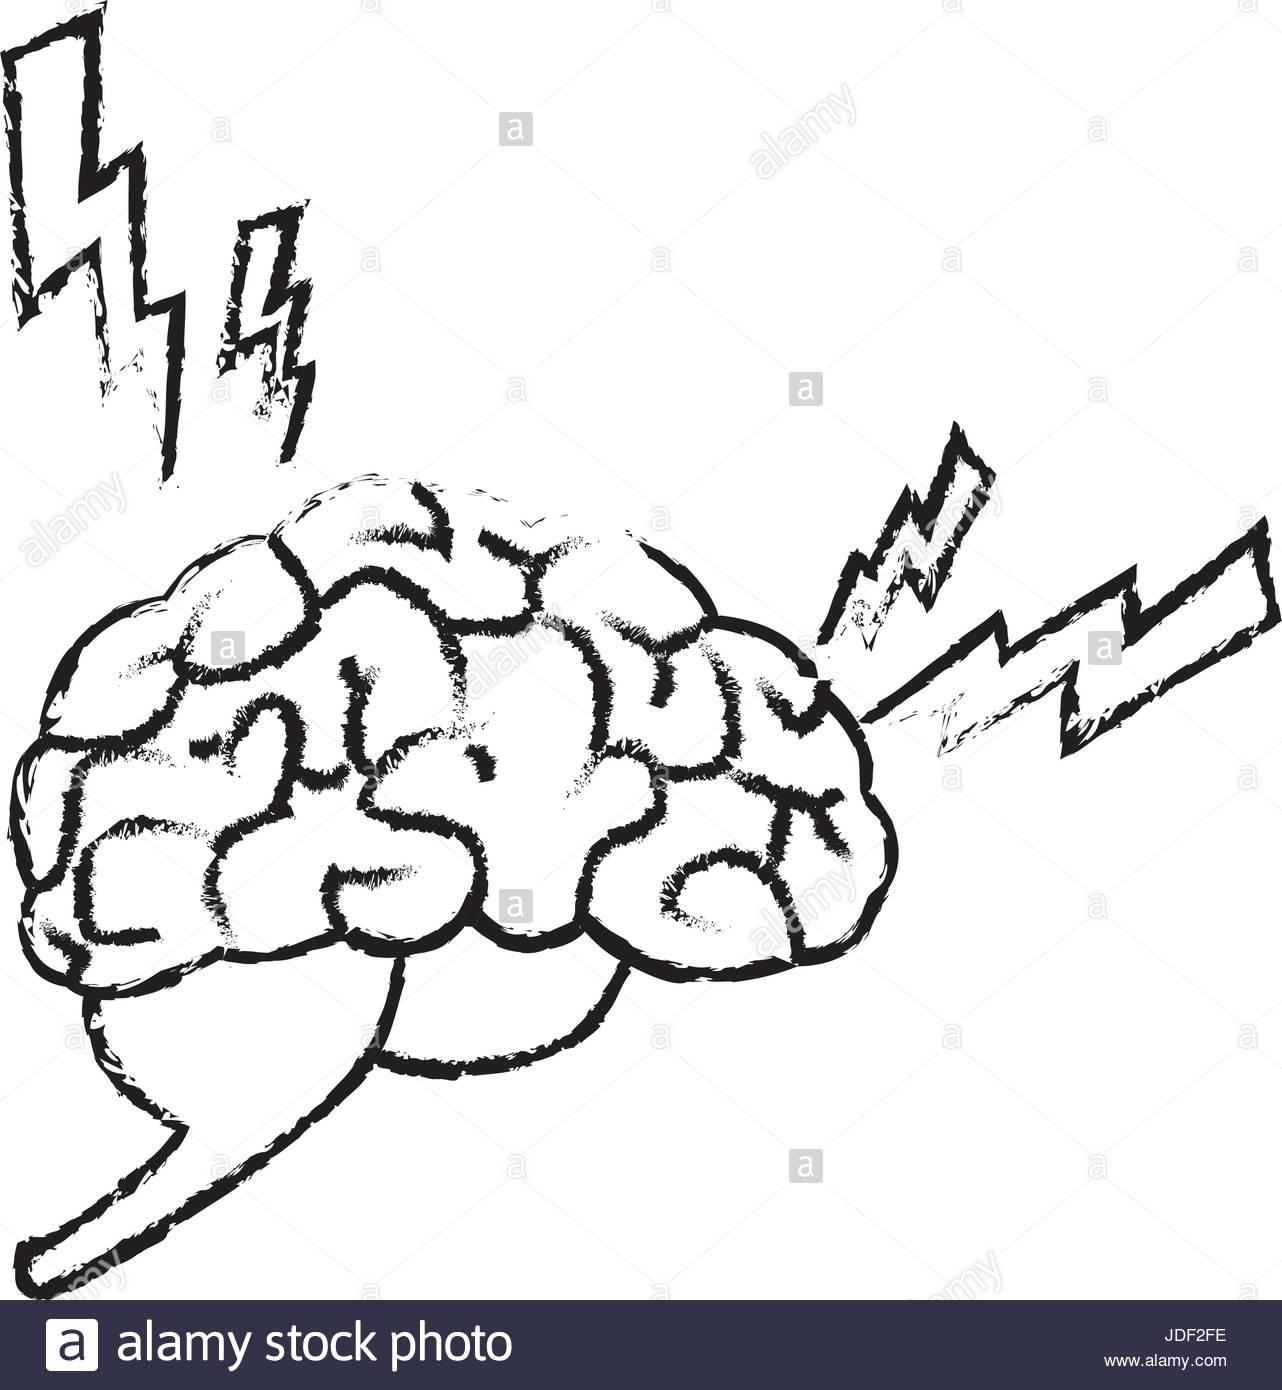 1282x1390 Drawing Brain Human Headache Pain Sick Organ Stock Vector Art